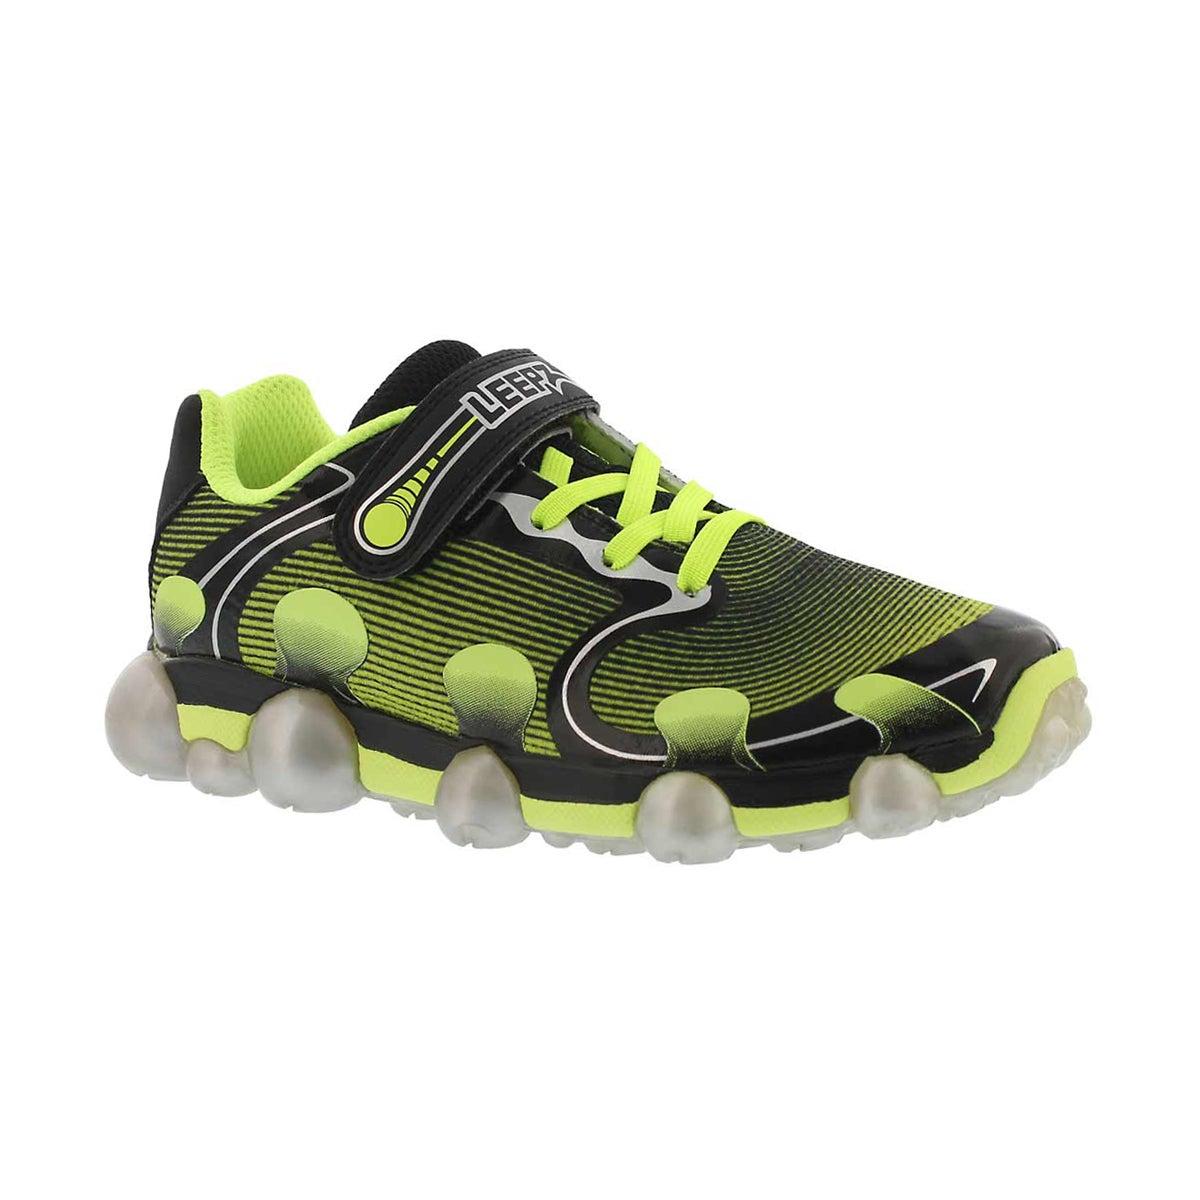 Boys' LEEPZ 2.0 black/yellow light up sneakers